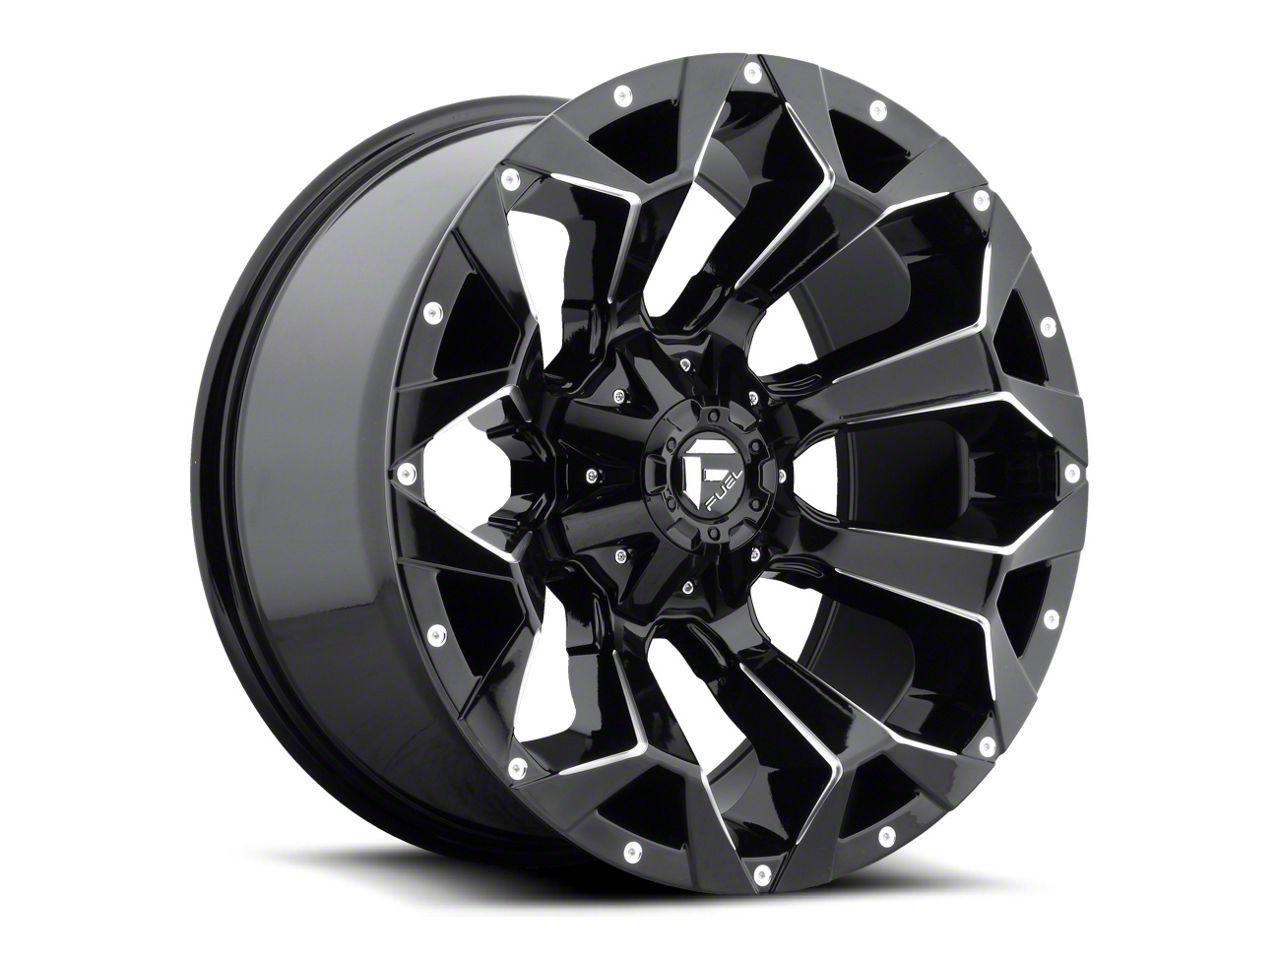 Fuel Wheels Assault Gloss Black 6-Lug Wheel - 20x10 (07-18 Sierra 1500)